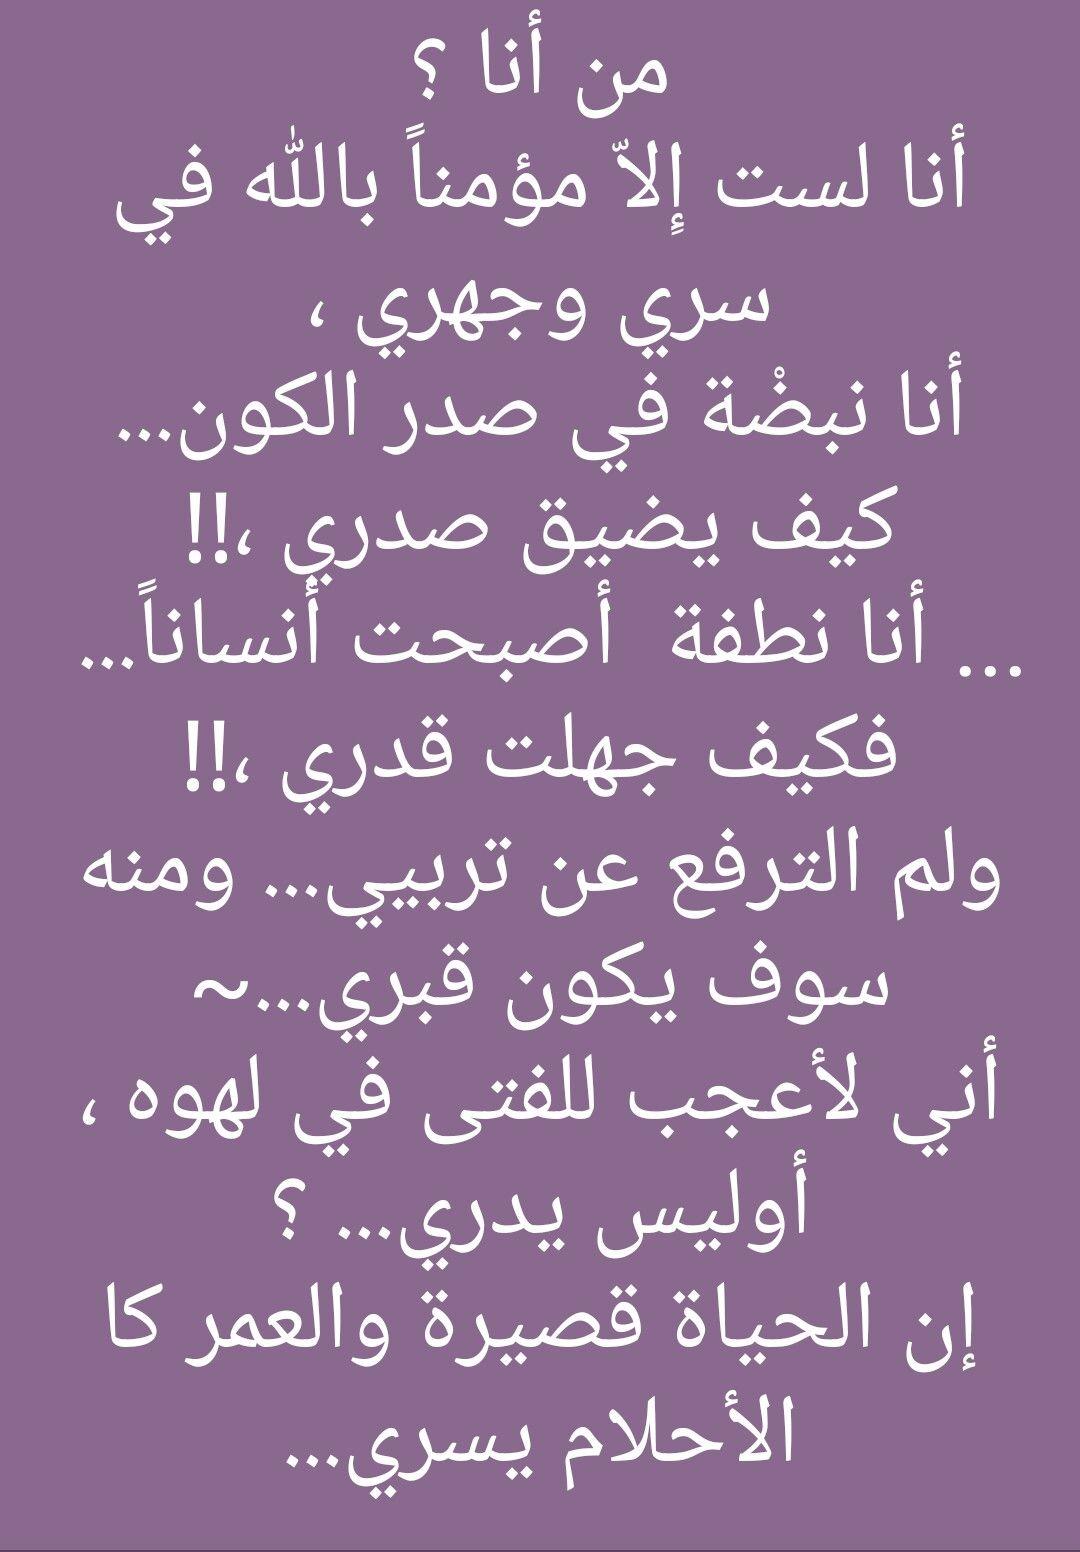 Pin By أن المتقين في مقام أمين On أحبك ربي Math Arabic Calligraphy Calligraphy